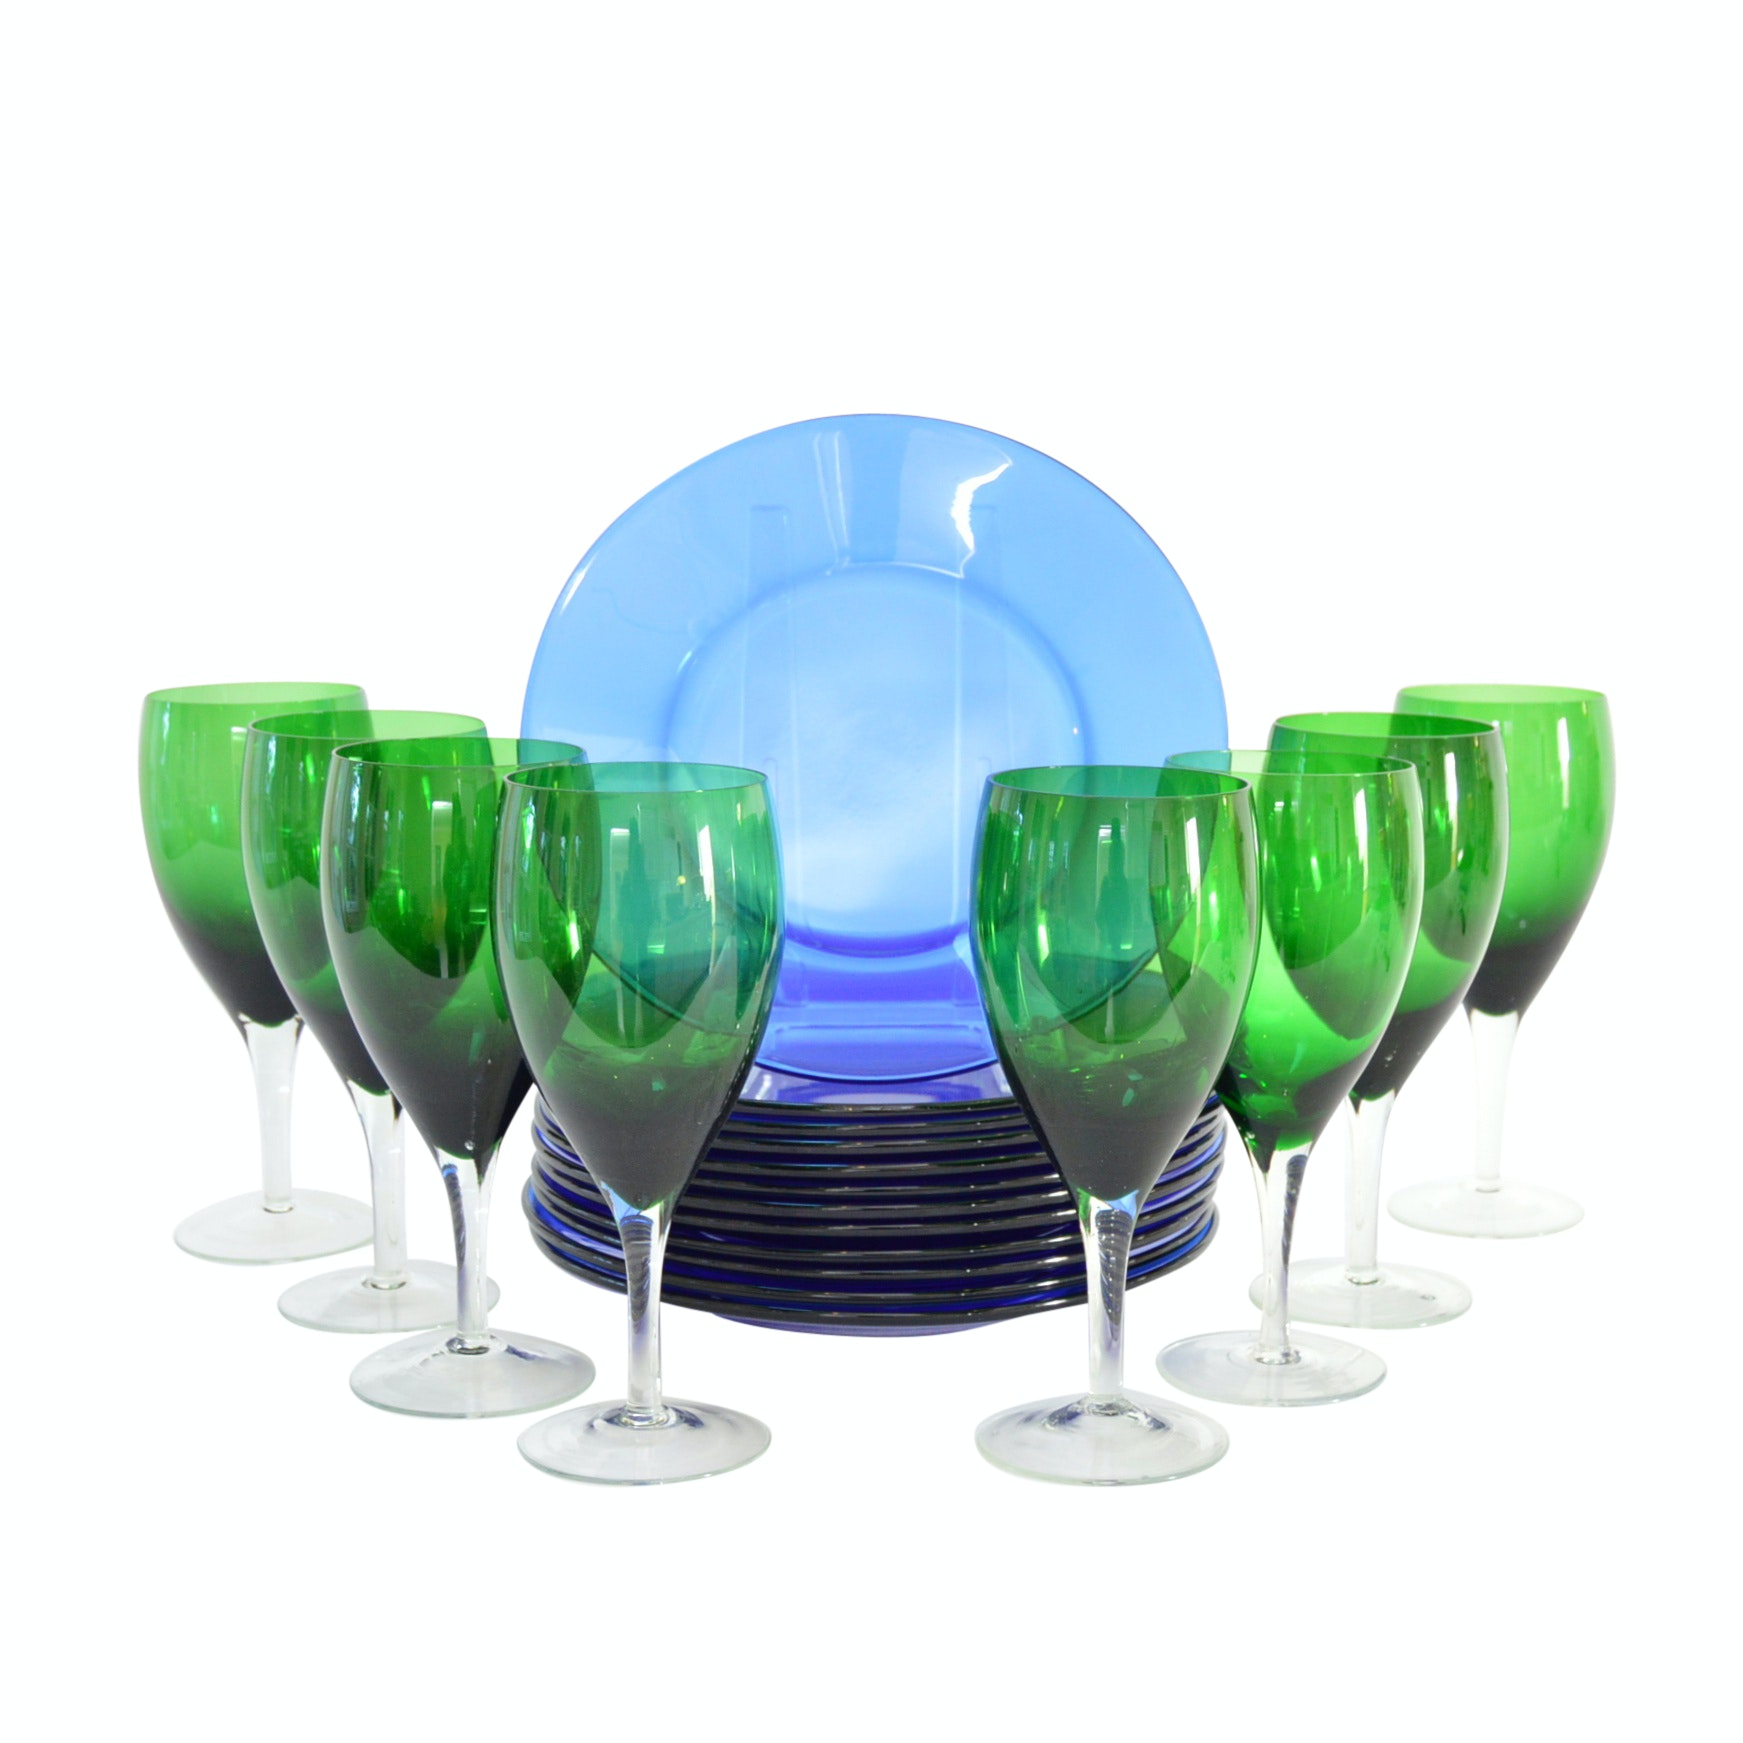 Vintage Cobalt Blue Glass Plates and Green Wine Glasses